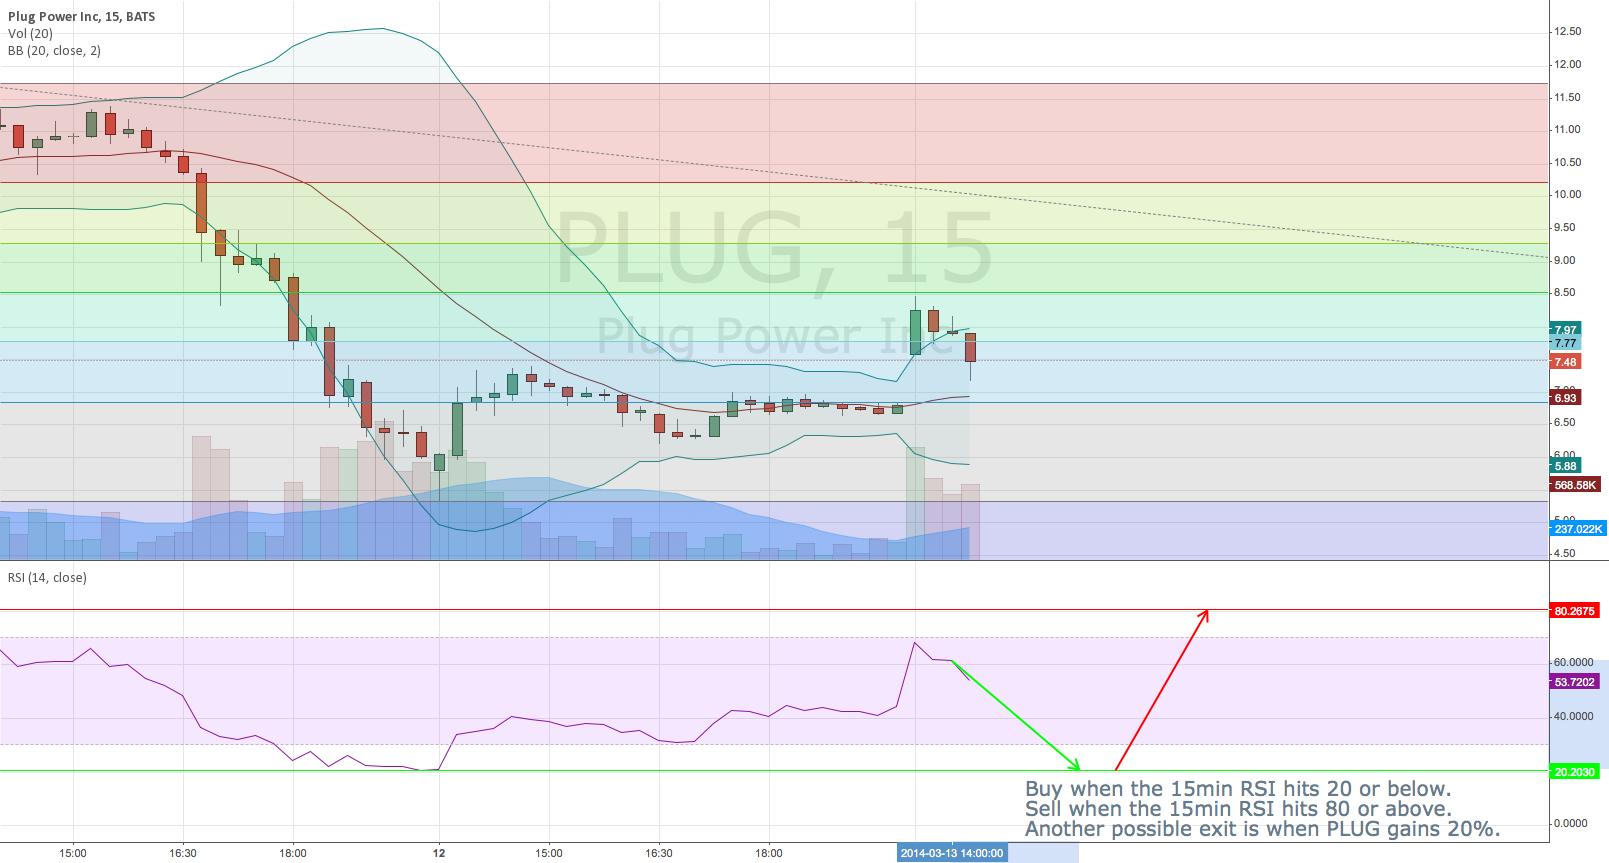 PLUG Short Term RSI Strategy Using 15 min Chart.